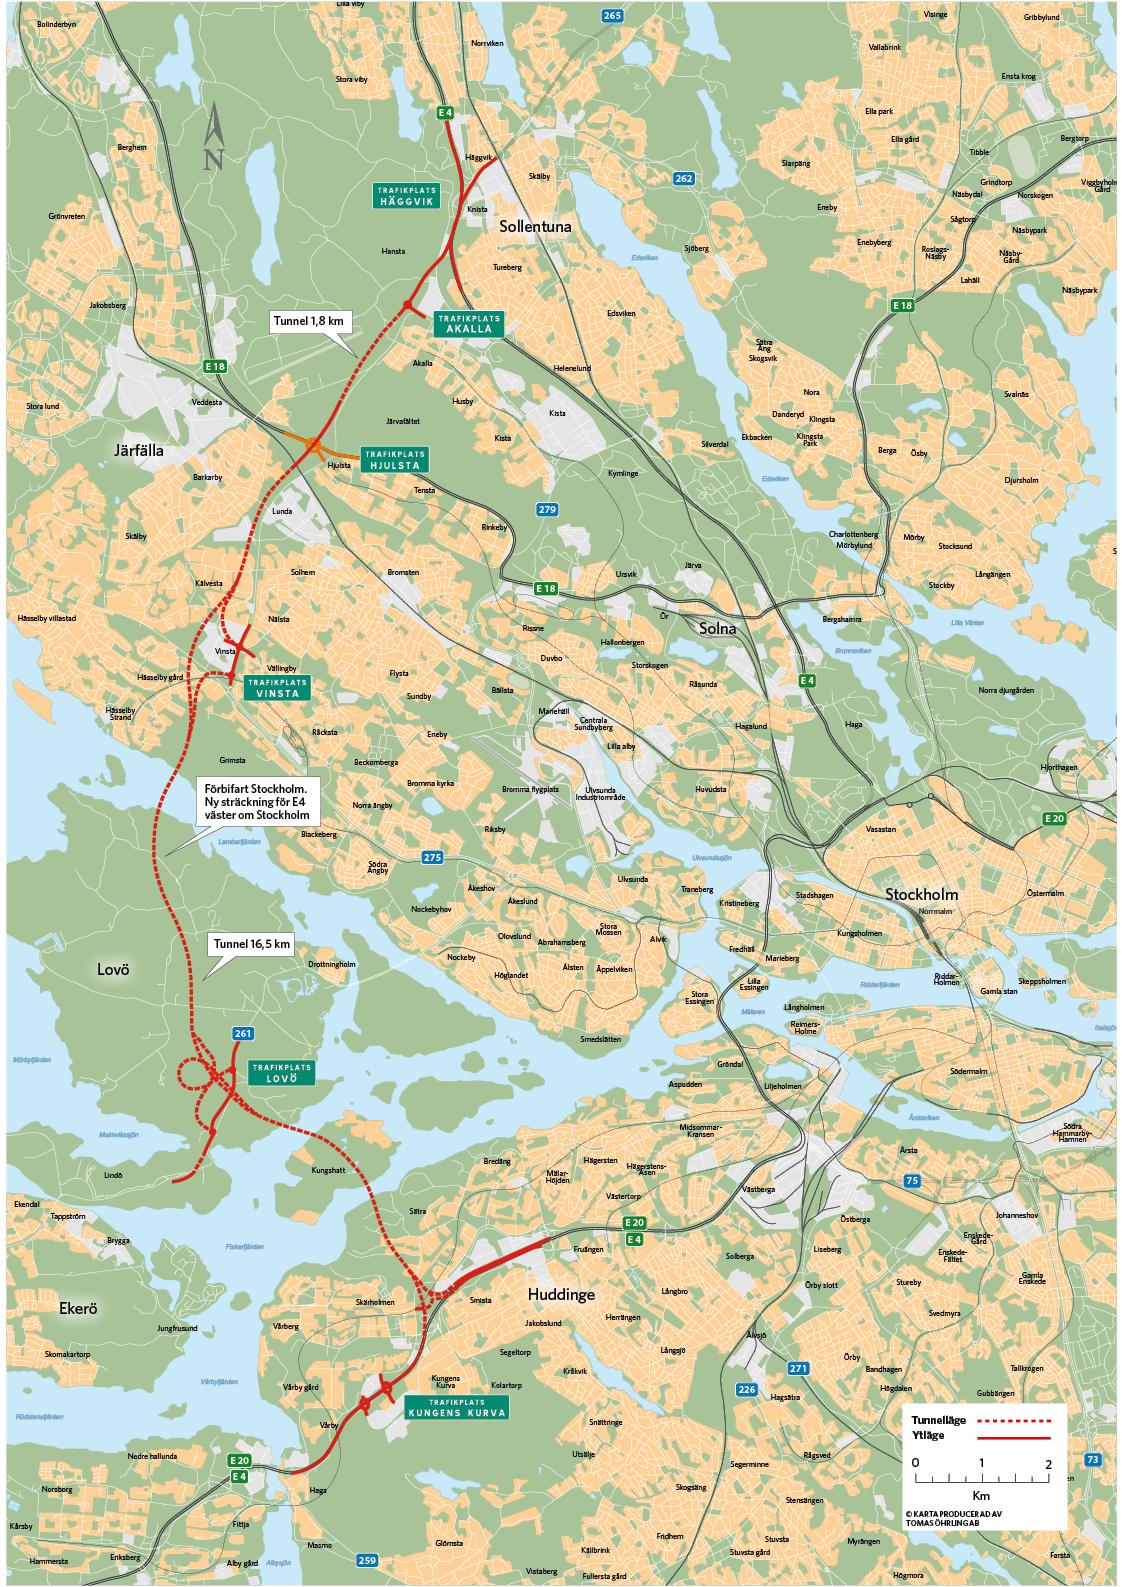 förbifart stockholm karta Förbifart Stockholm byggs | stockholmiana förbifart stockholm karta